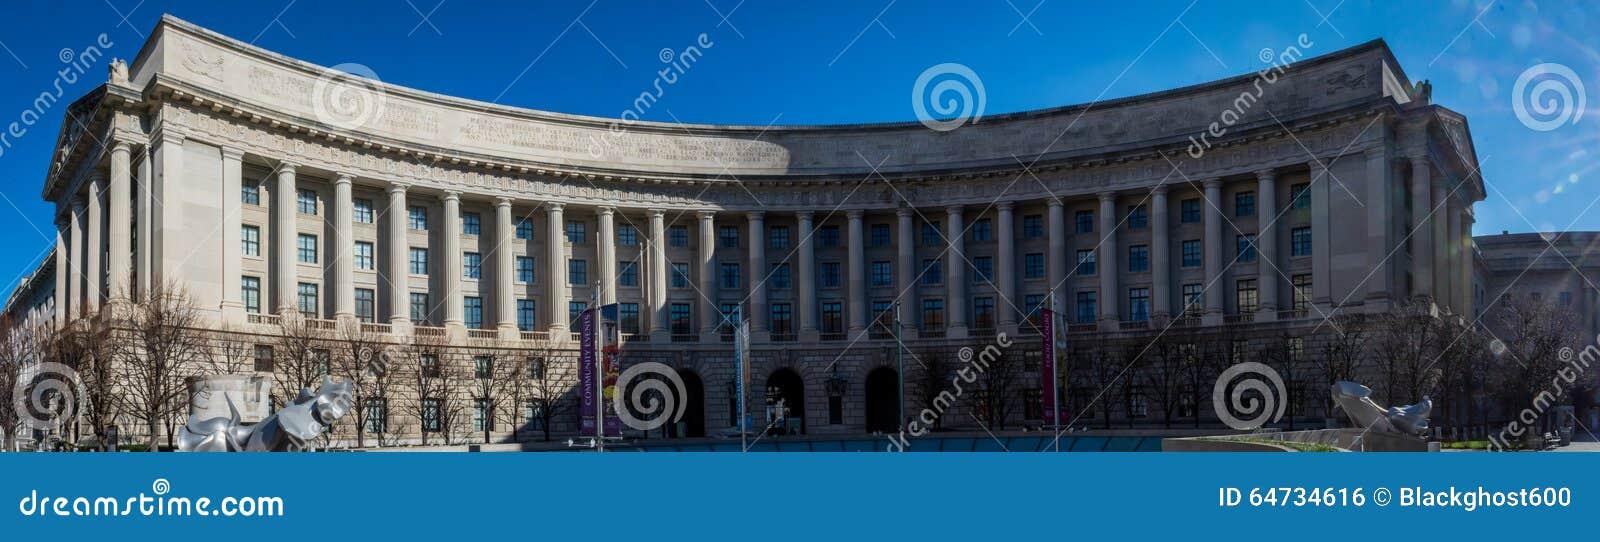 Woodrow Wilson Plaza in Washington DC